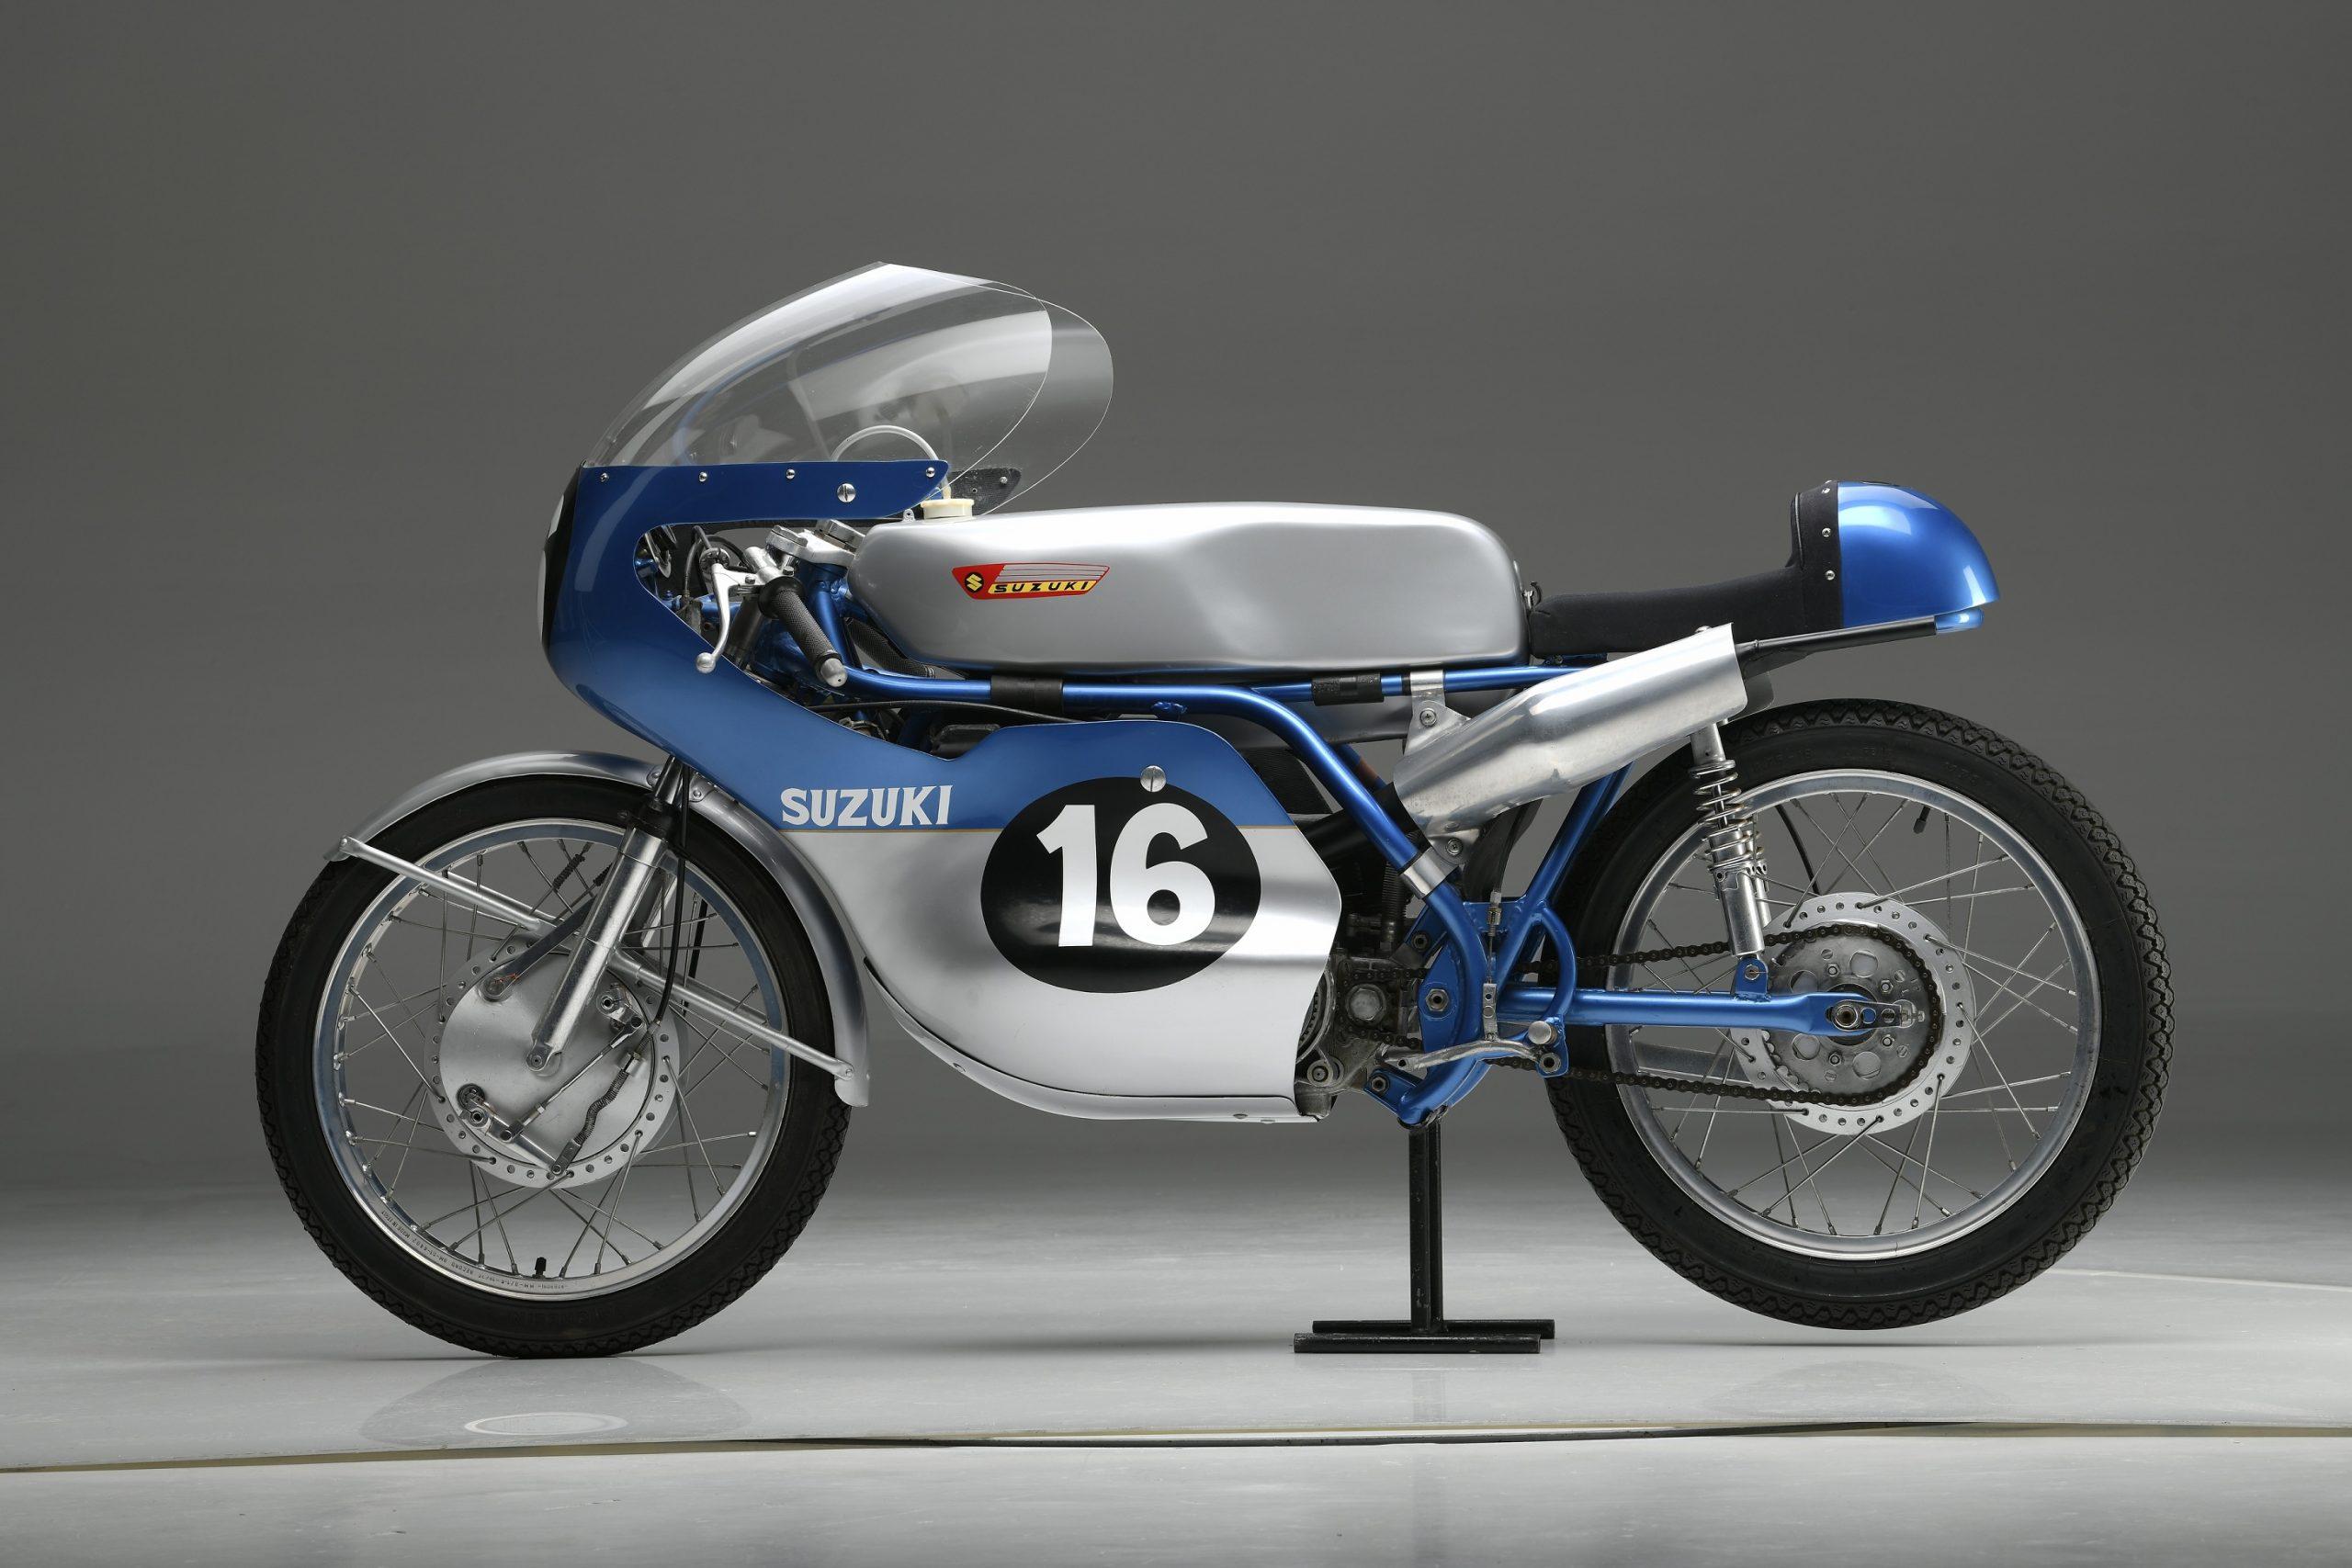 suzuki 100 anos 4 modelo rt 67 dos anos 1 960 inspiradora da decoracao da gsx r 1000r 100th anniversary e gsx rr campea mundial